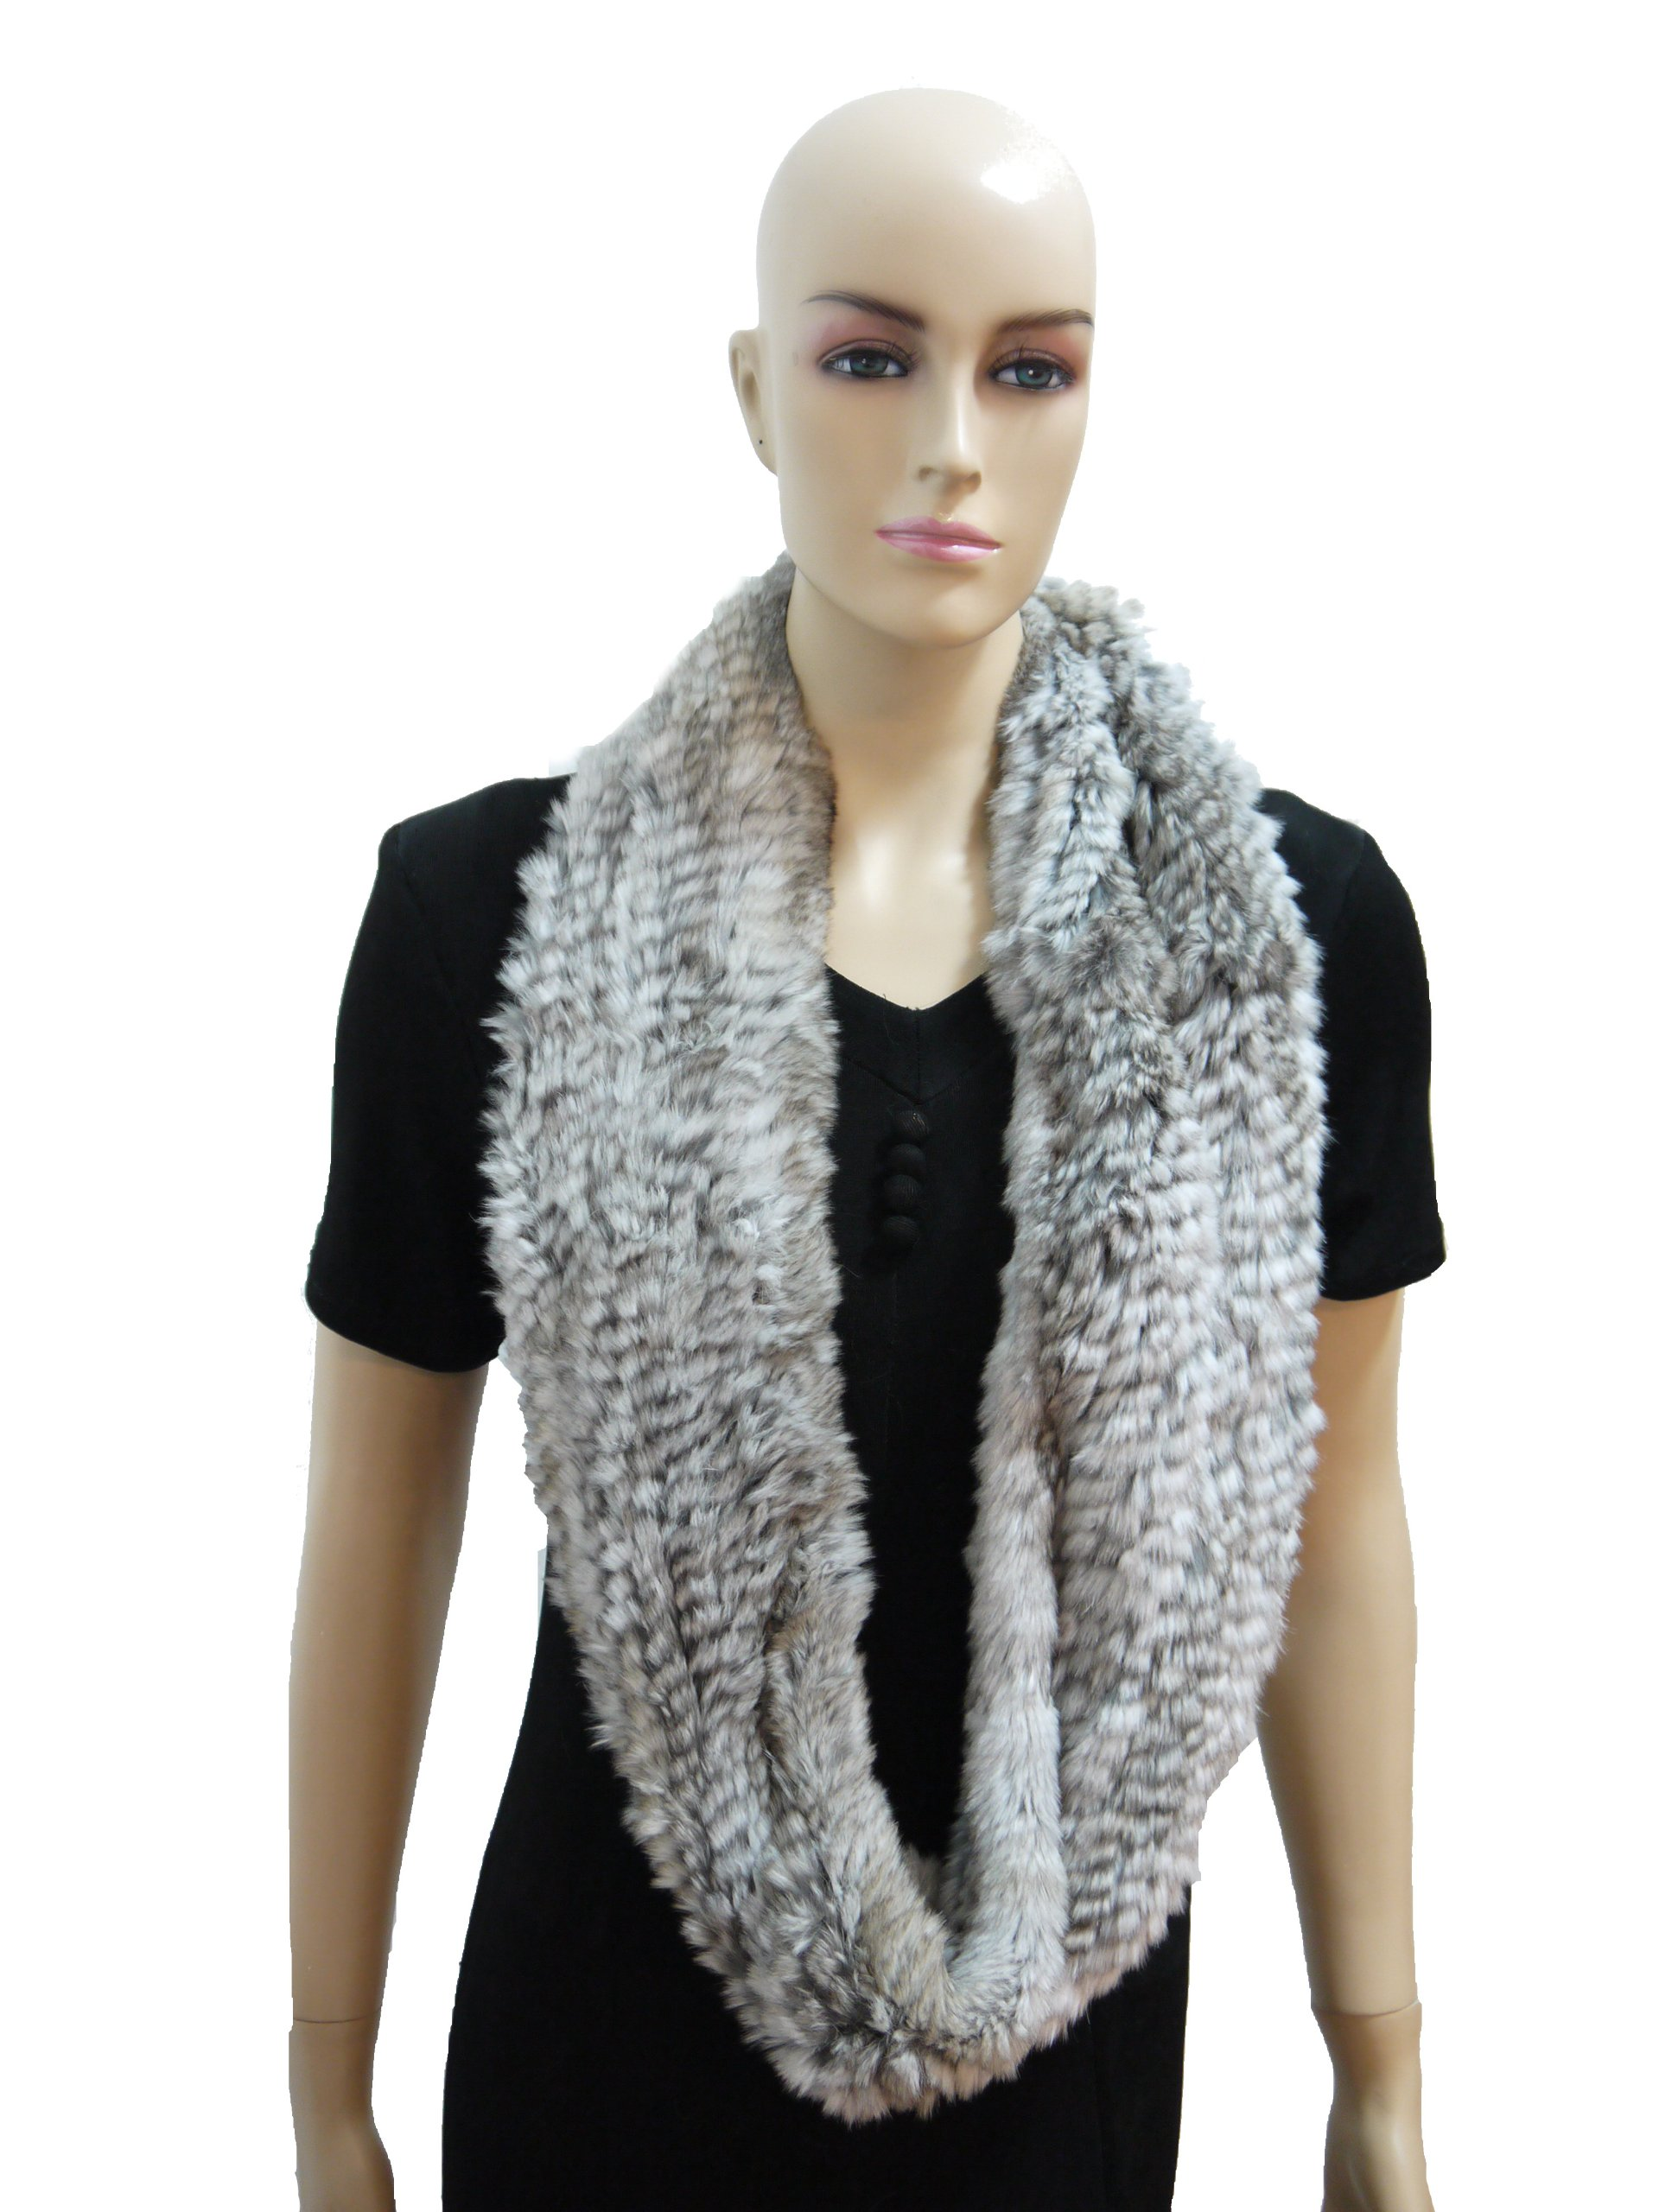 55'' Rex Rabbit Fur Infinity Scarf (Natural Grey) by Hima